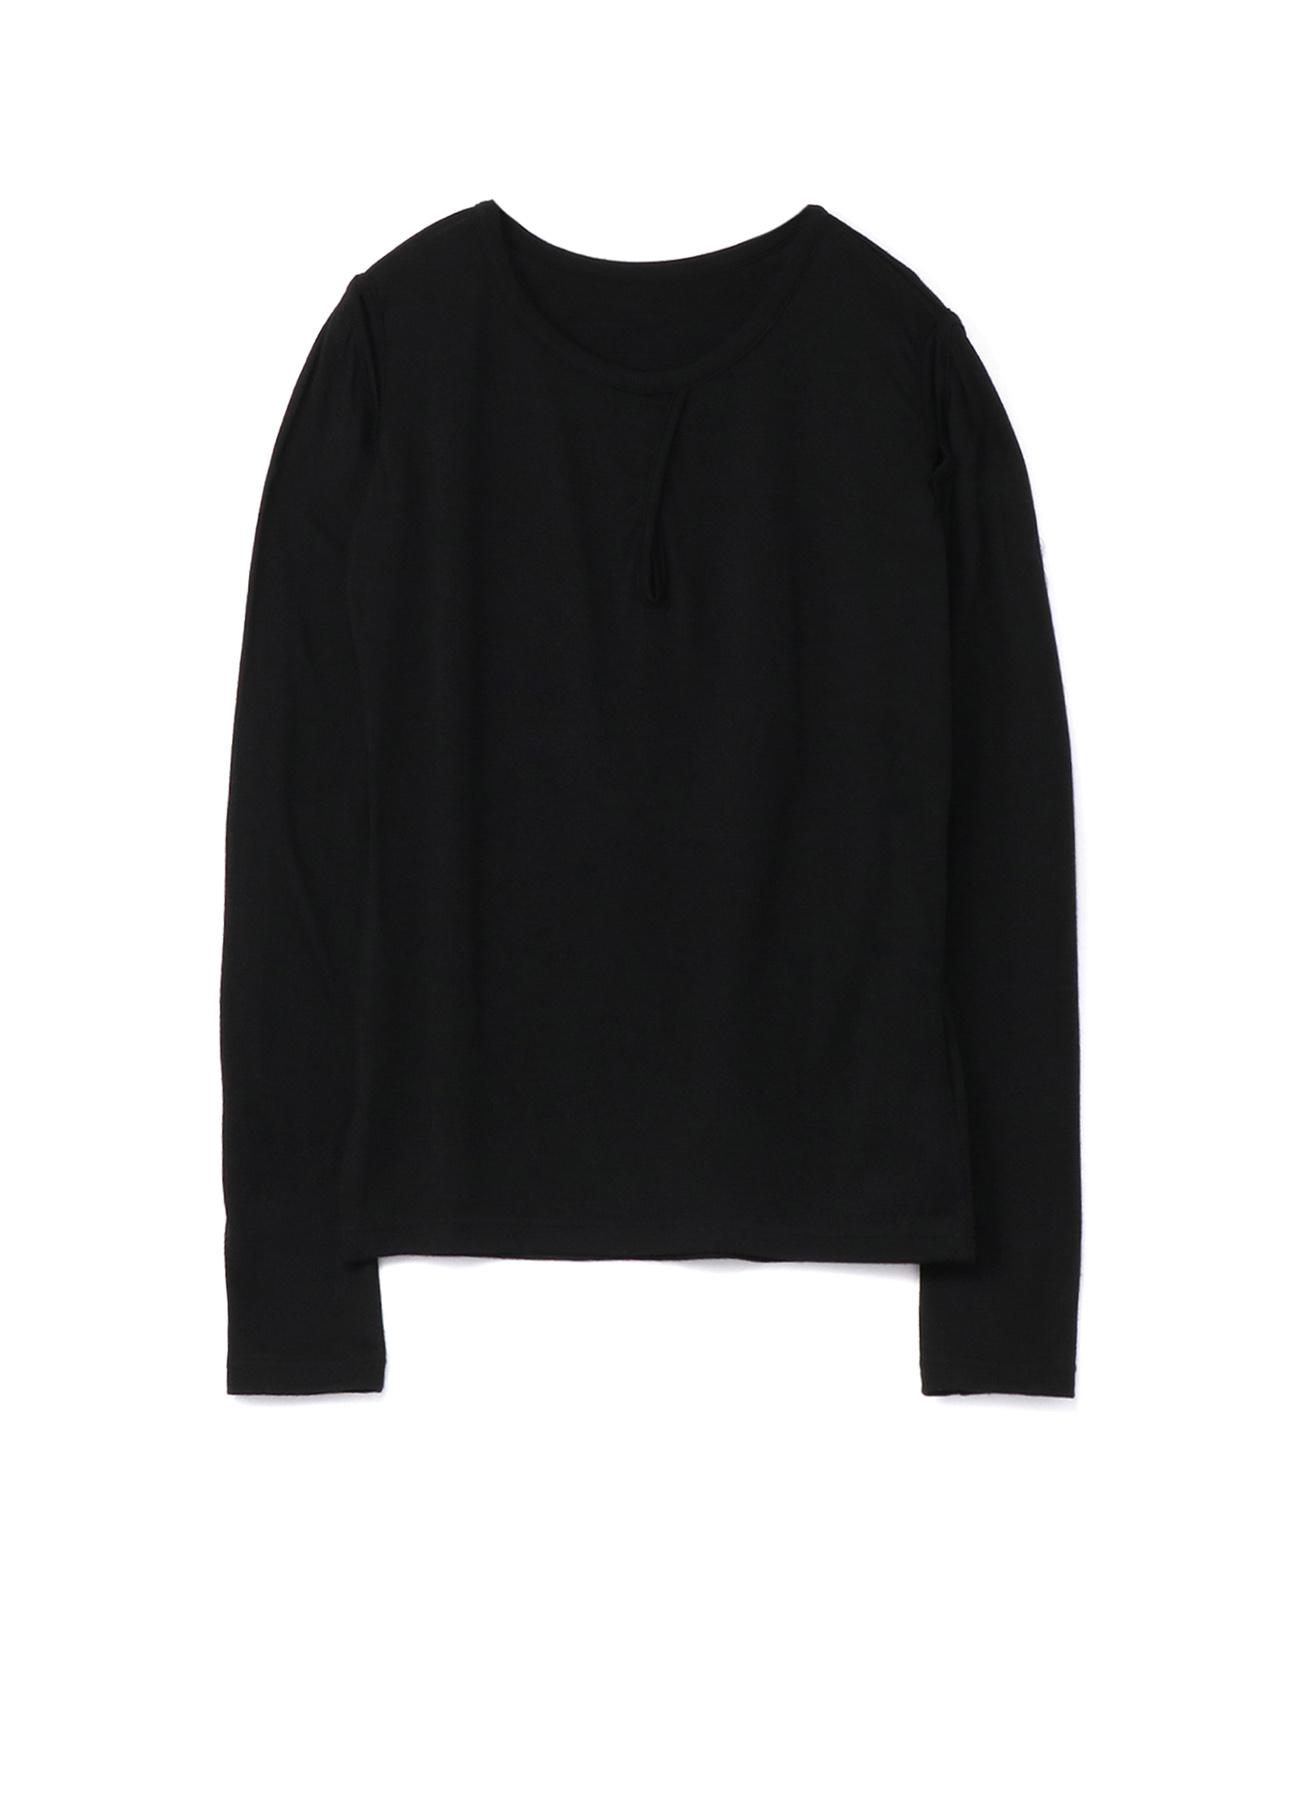 2/60 Wool Plain stitch Sleeve Slit T-Shirt A